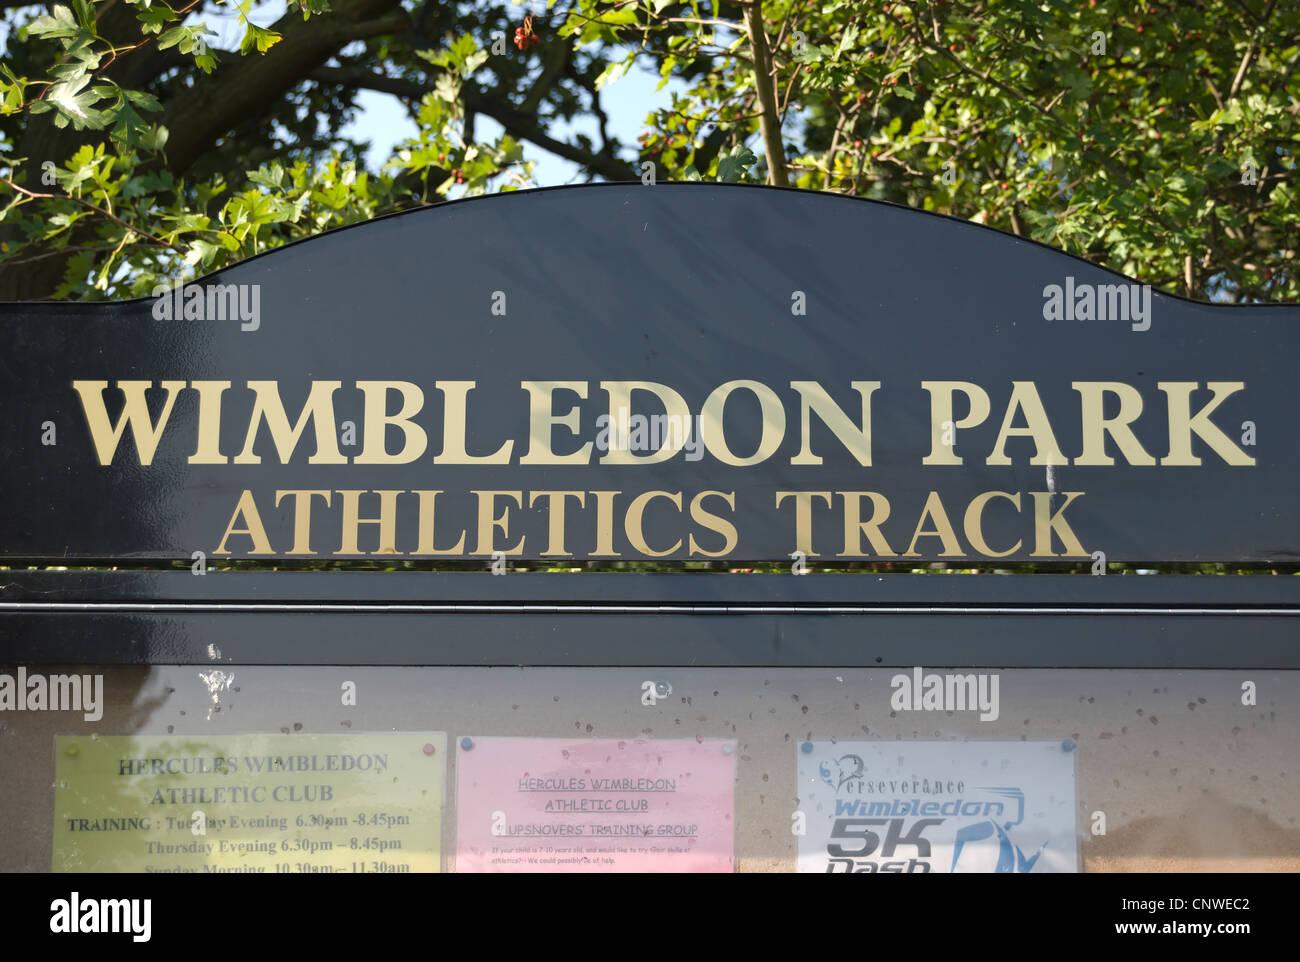 noticeboard for wimbledon park athletics track, southwest london, england - Stock Image